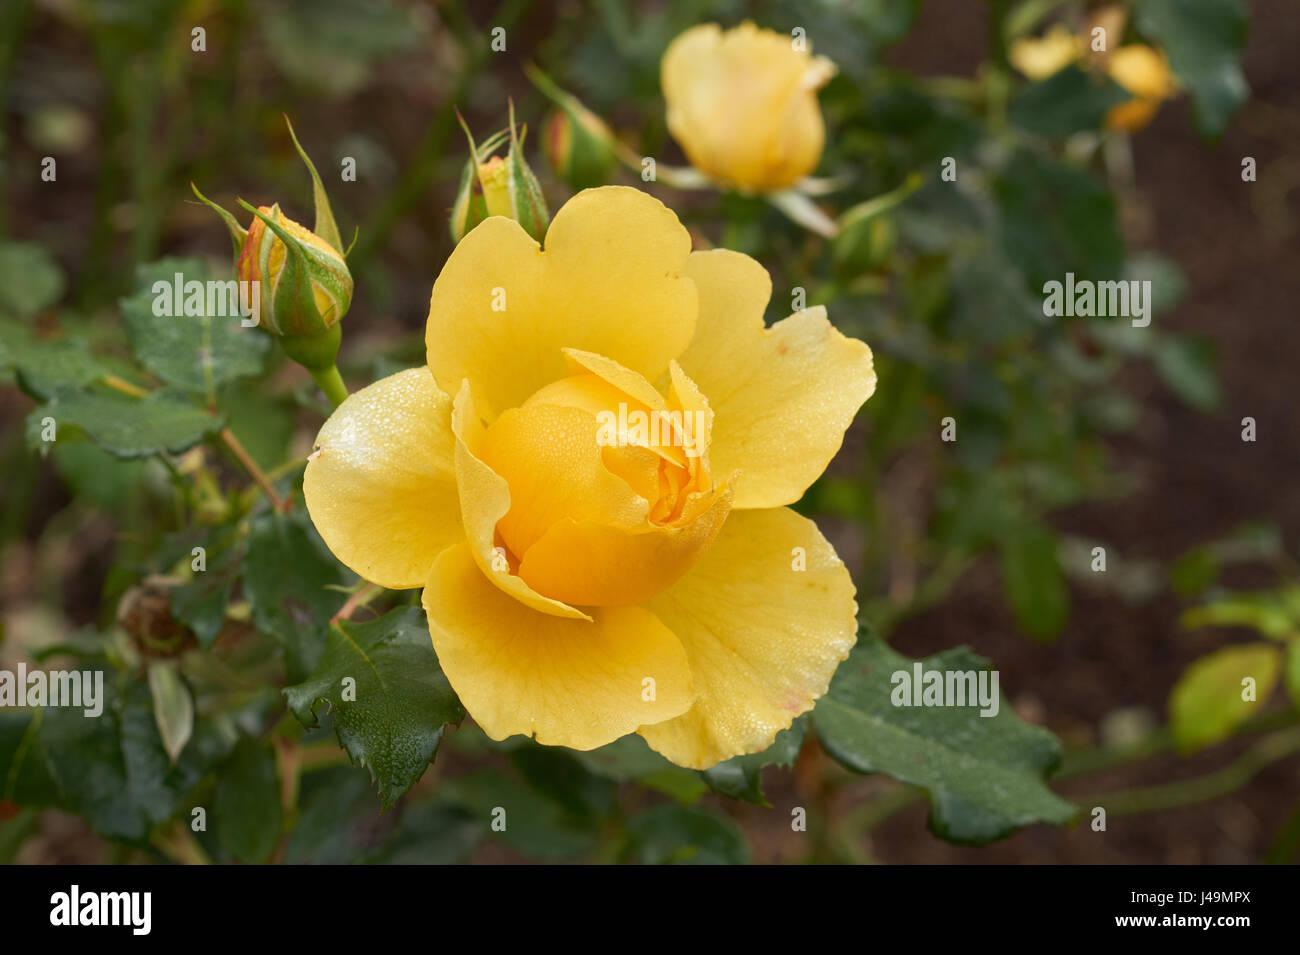 image of beautiful yellow rose close up - Stock Image